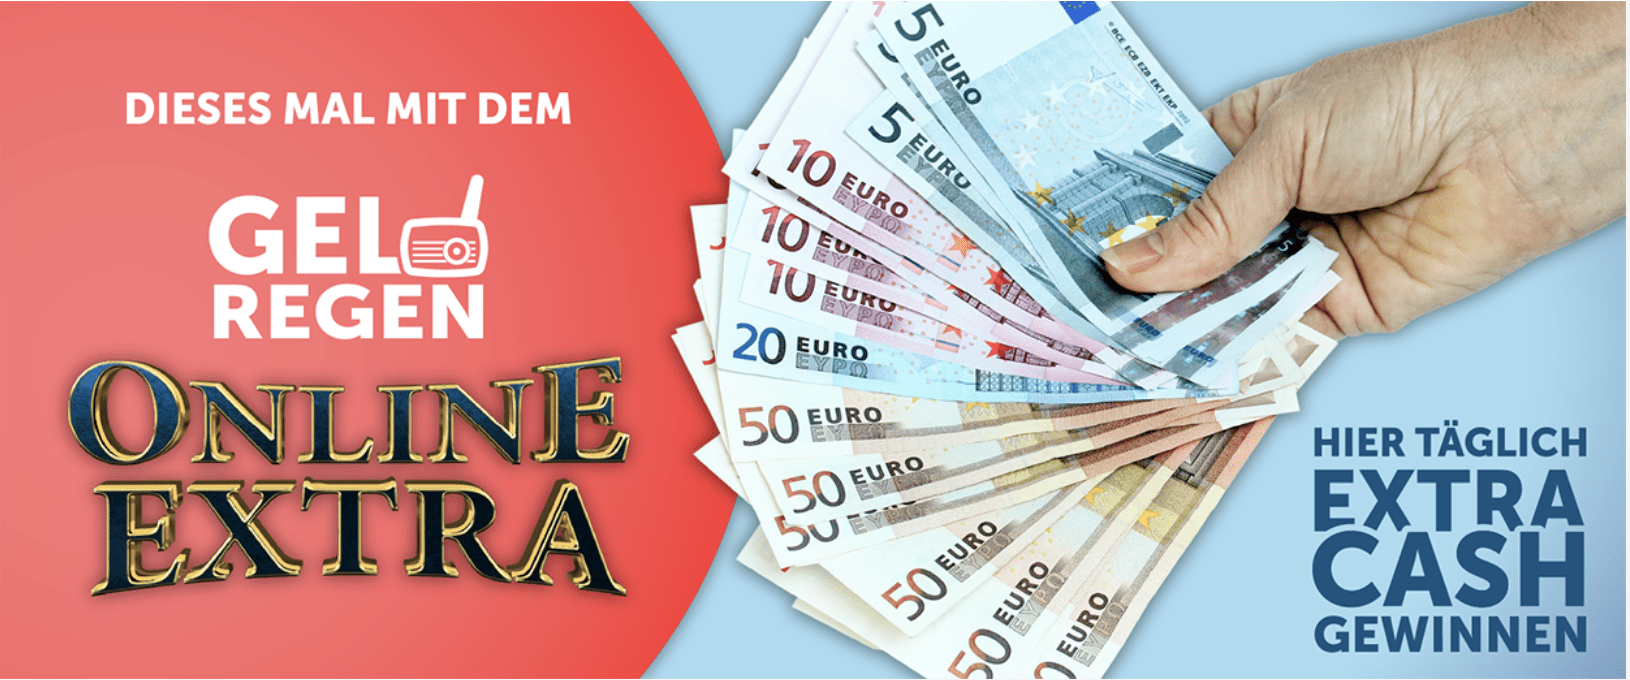 Gewinnspiel-Cases Radio & TV Geldregen online extra